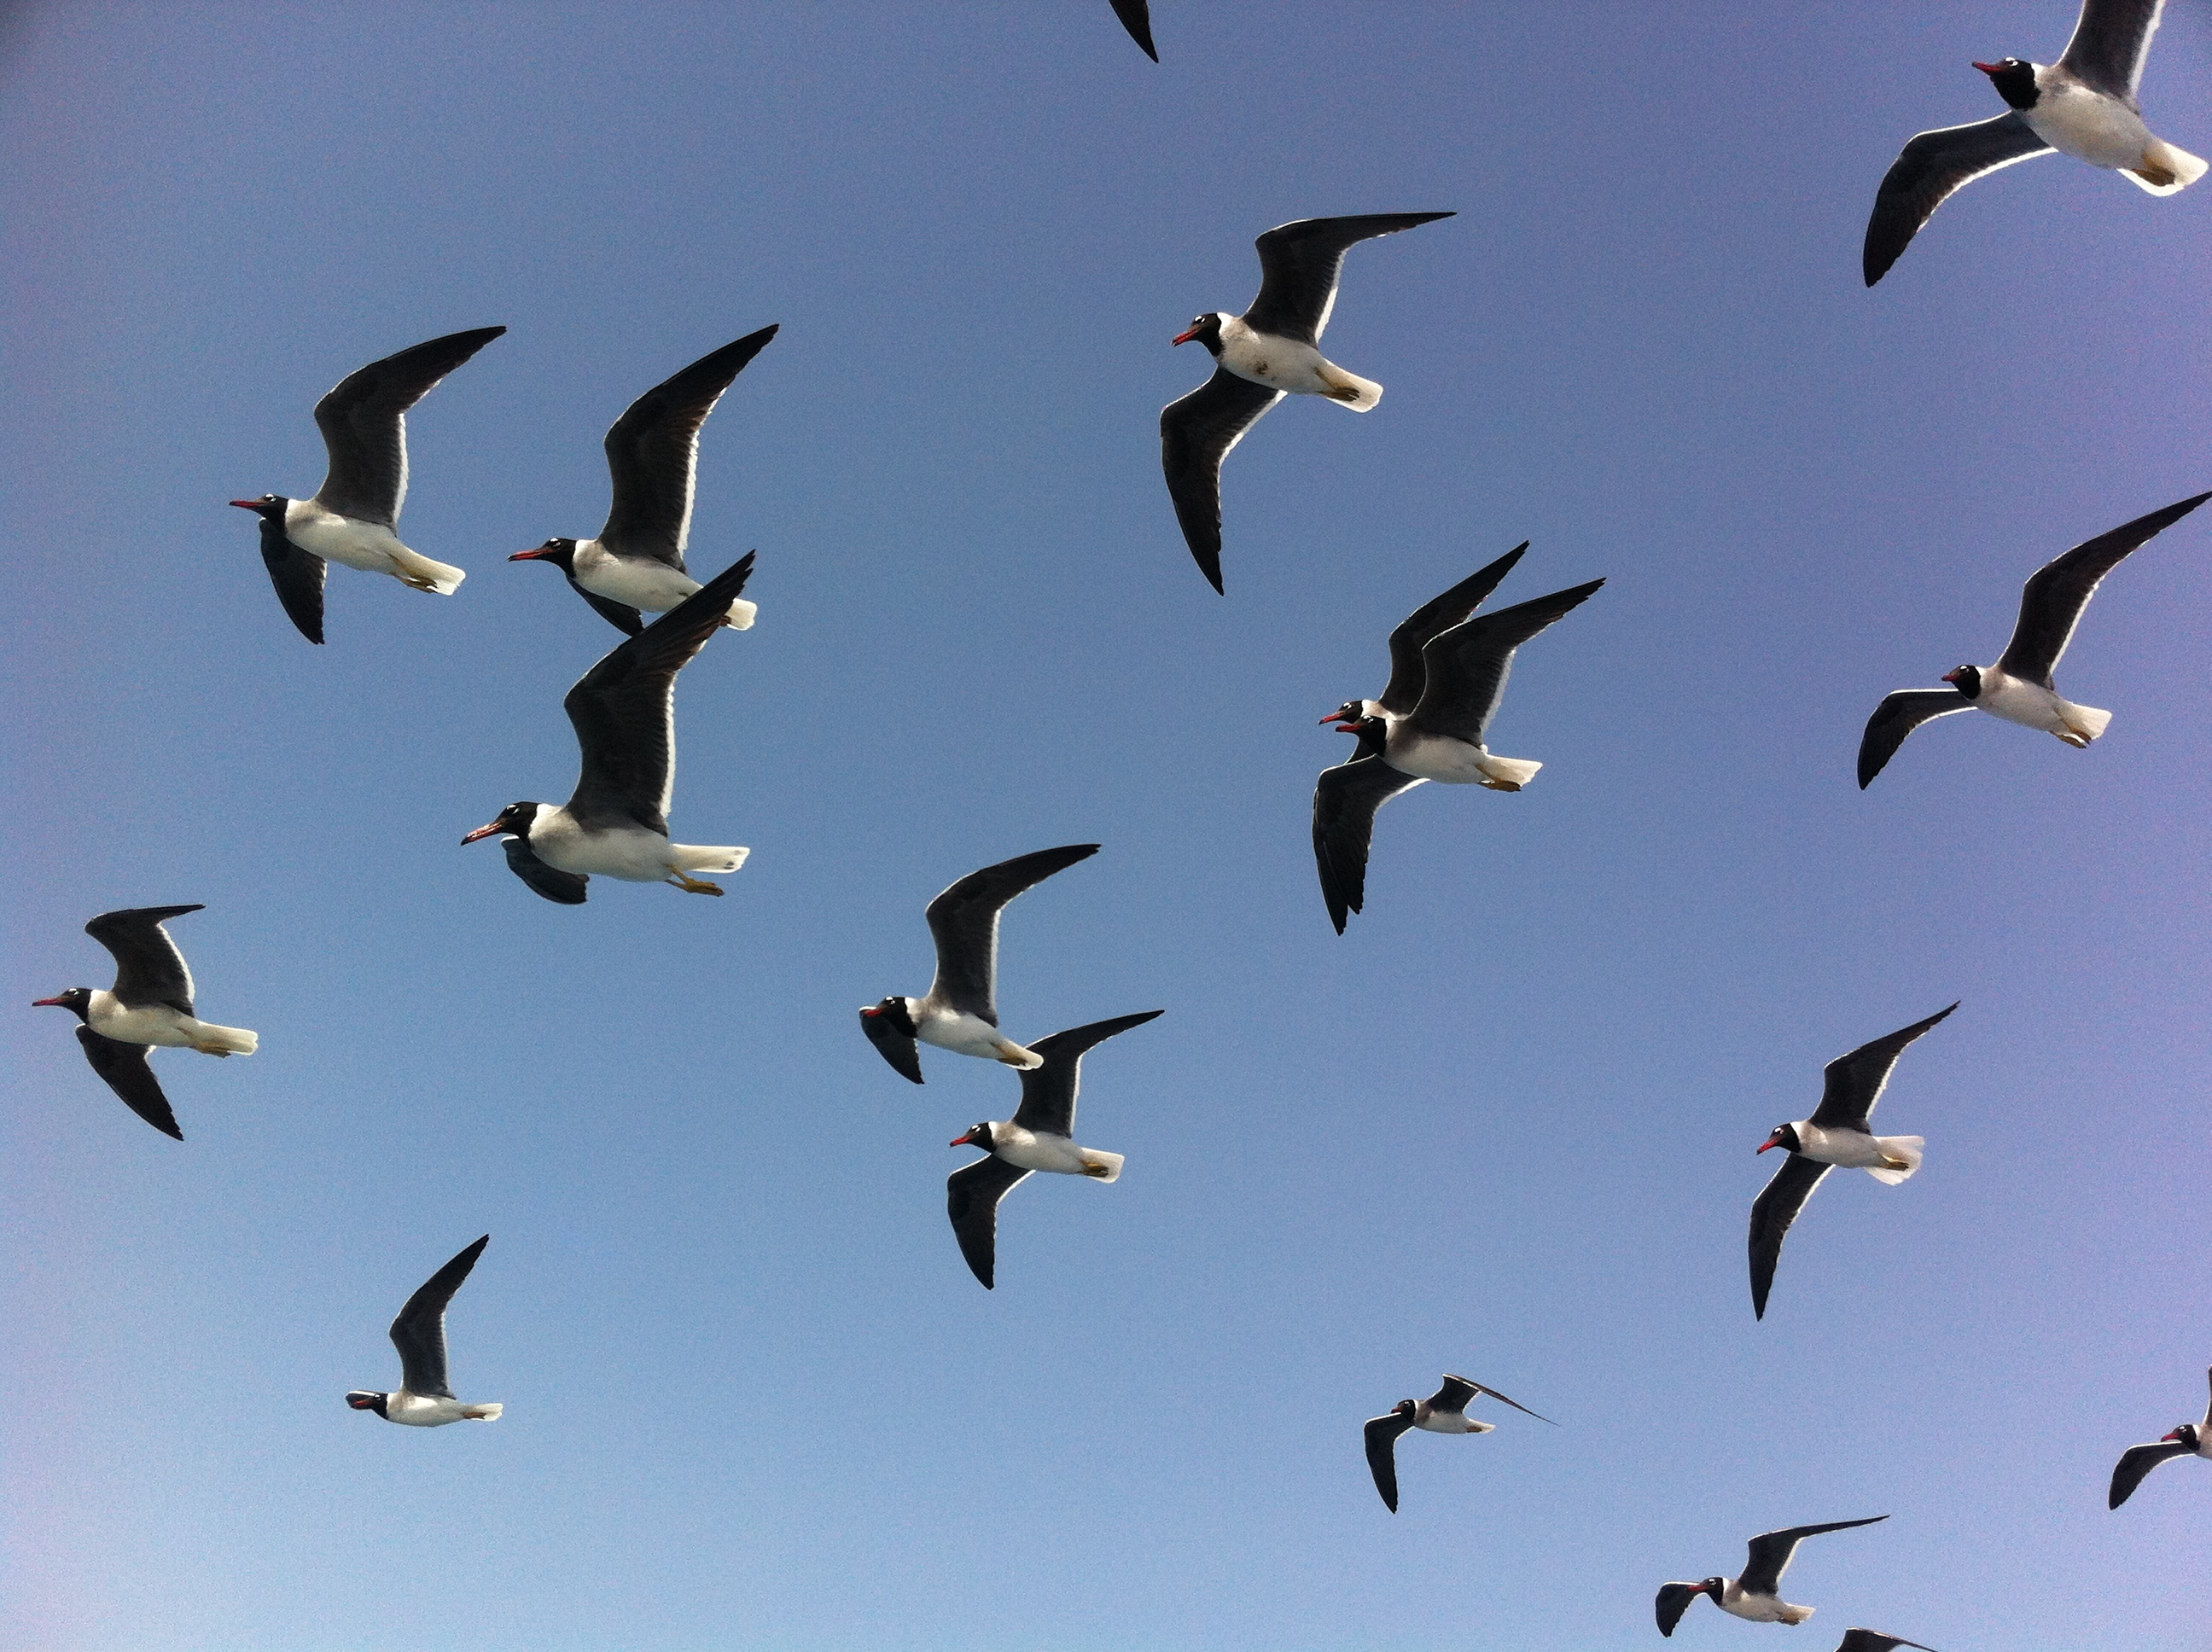 seagulls-redsea-egypt-lustforthesublime